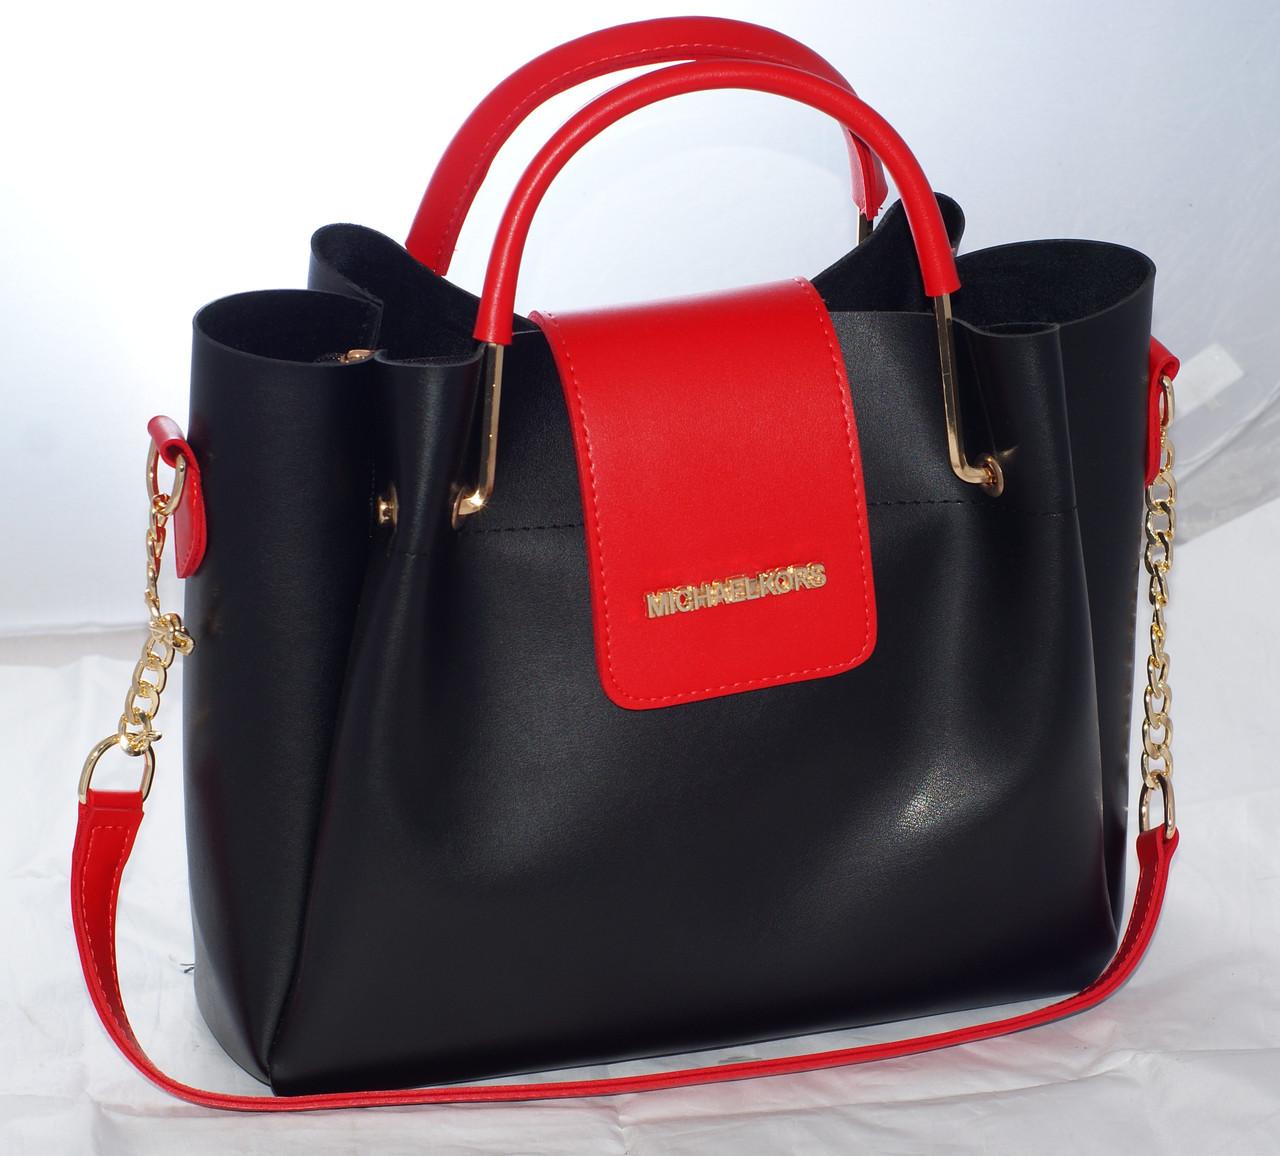 98699b8d8a9a Женская сумка Michael Kors (Майкл Корс), черная с красным  продажа ...